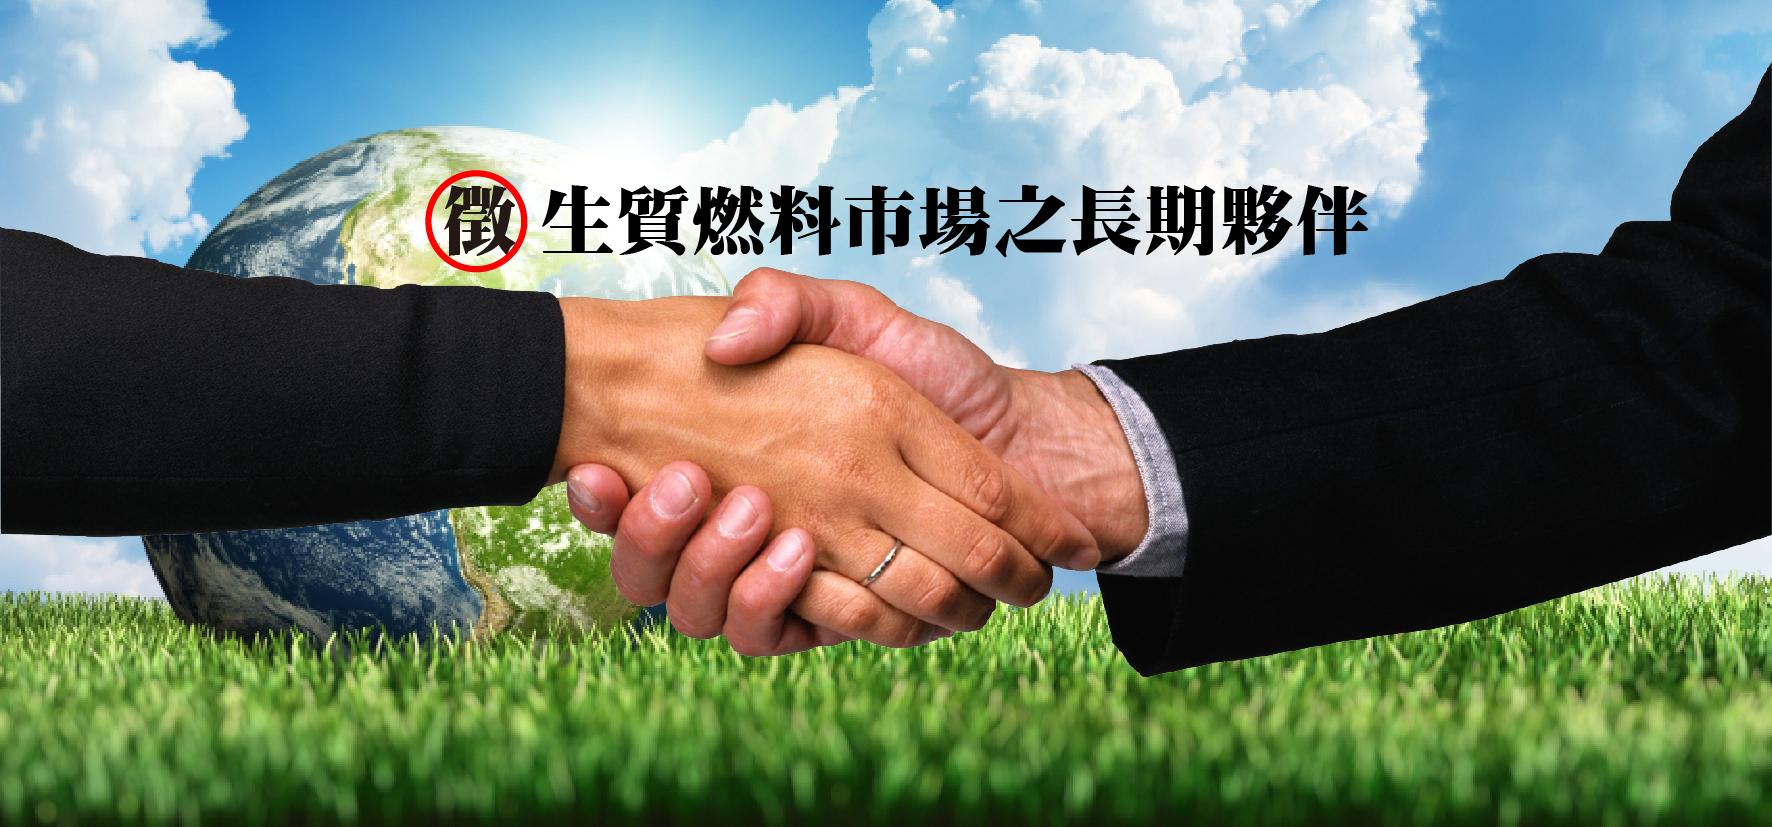 Banner_Hands_1700X900-01-01